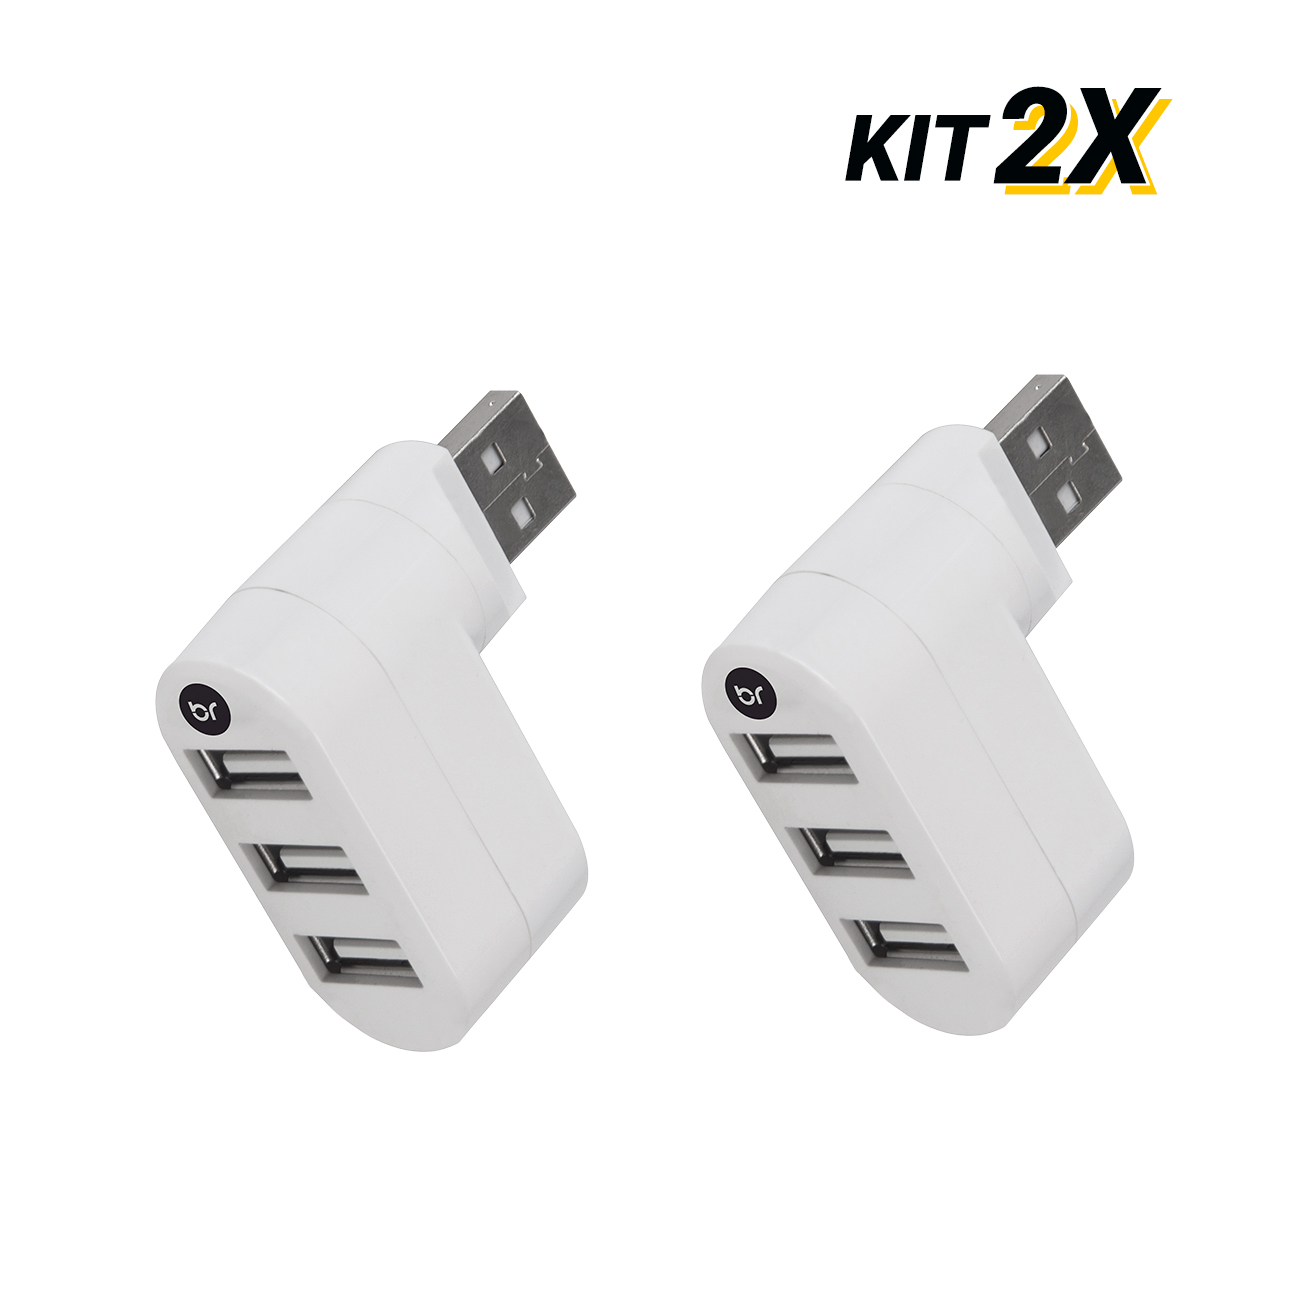 Kit 2 Mini Hub Usb Conector Giratório Com 3 Portas 2.0 Fast